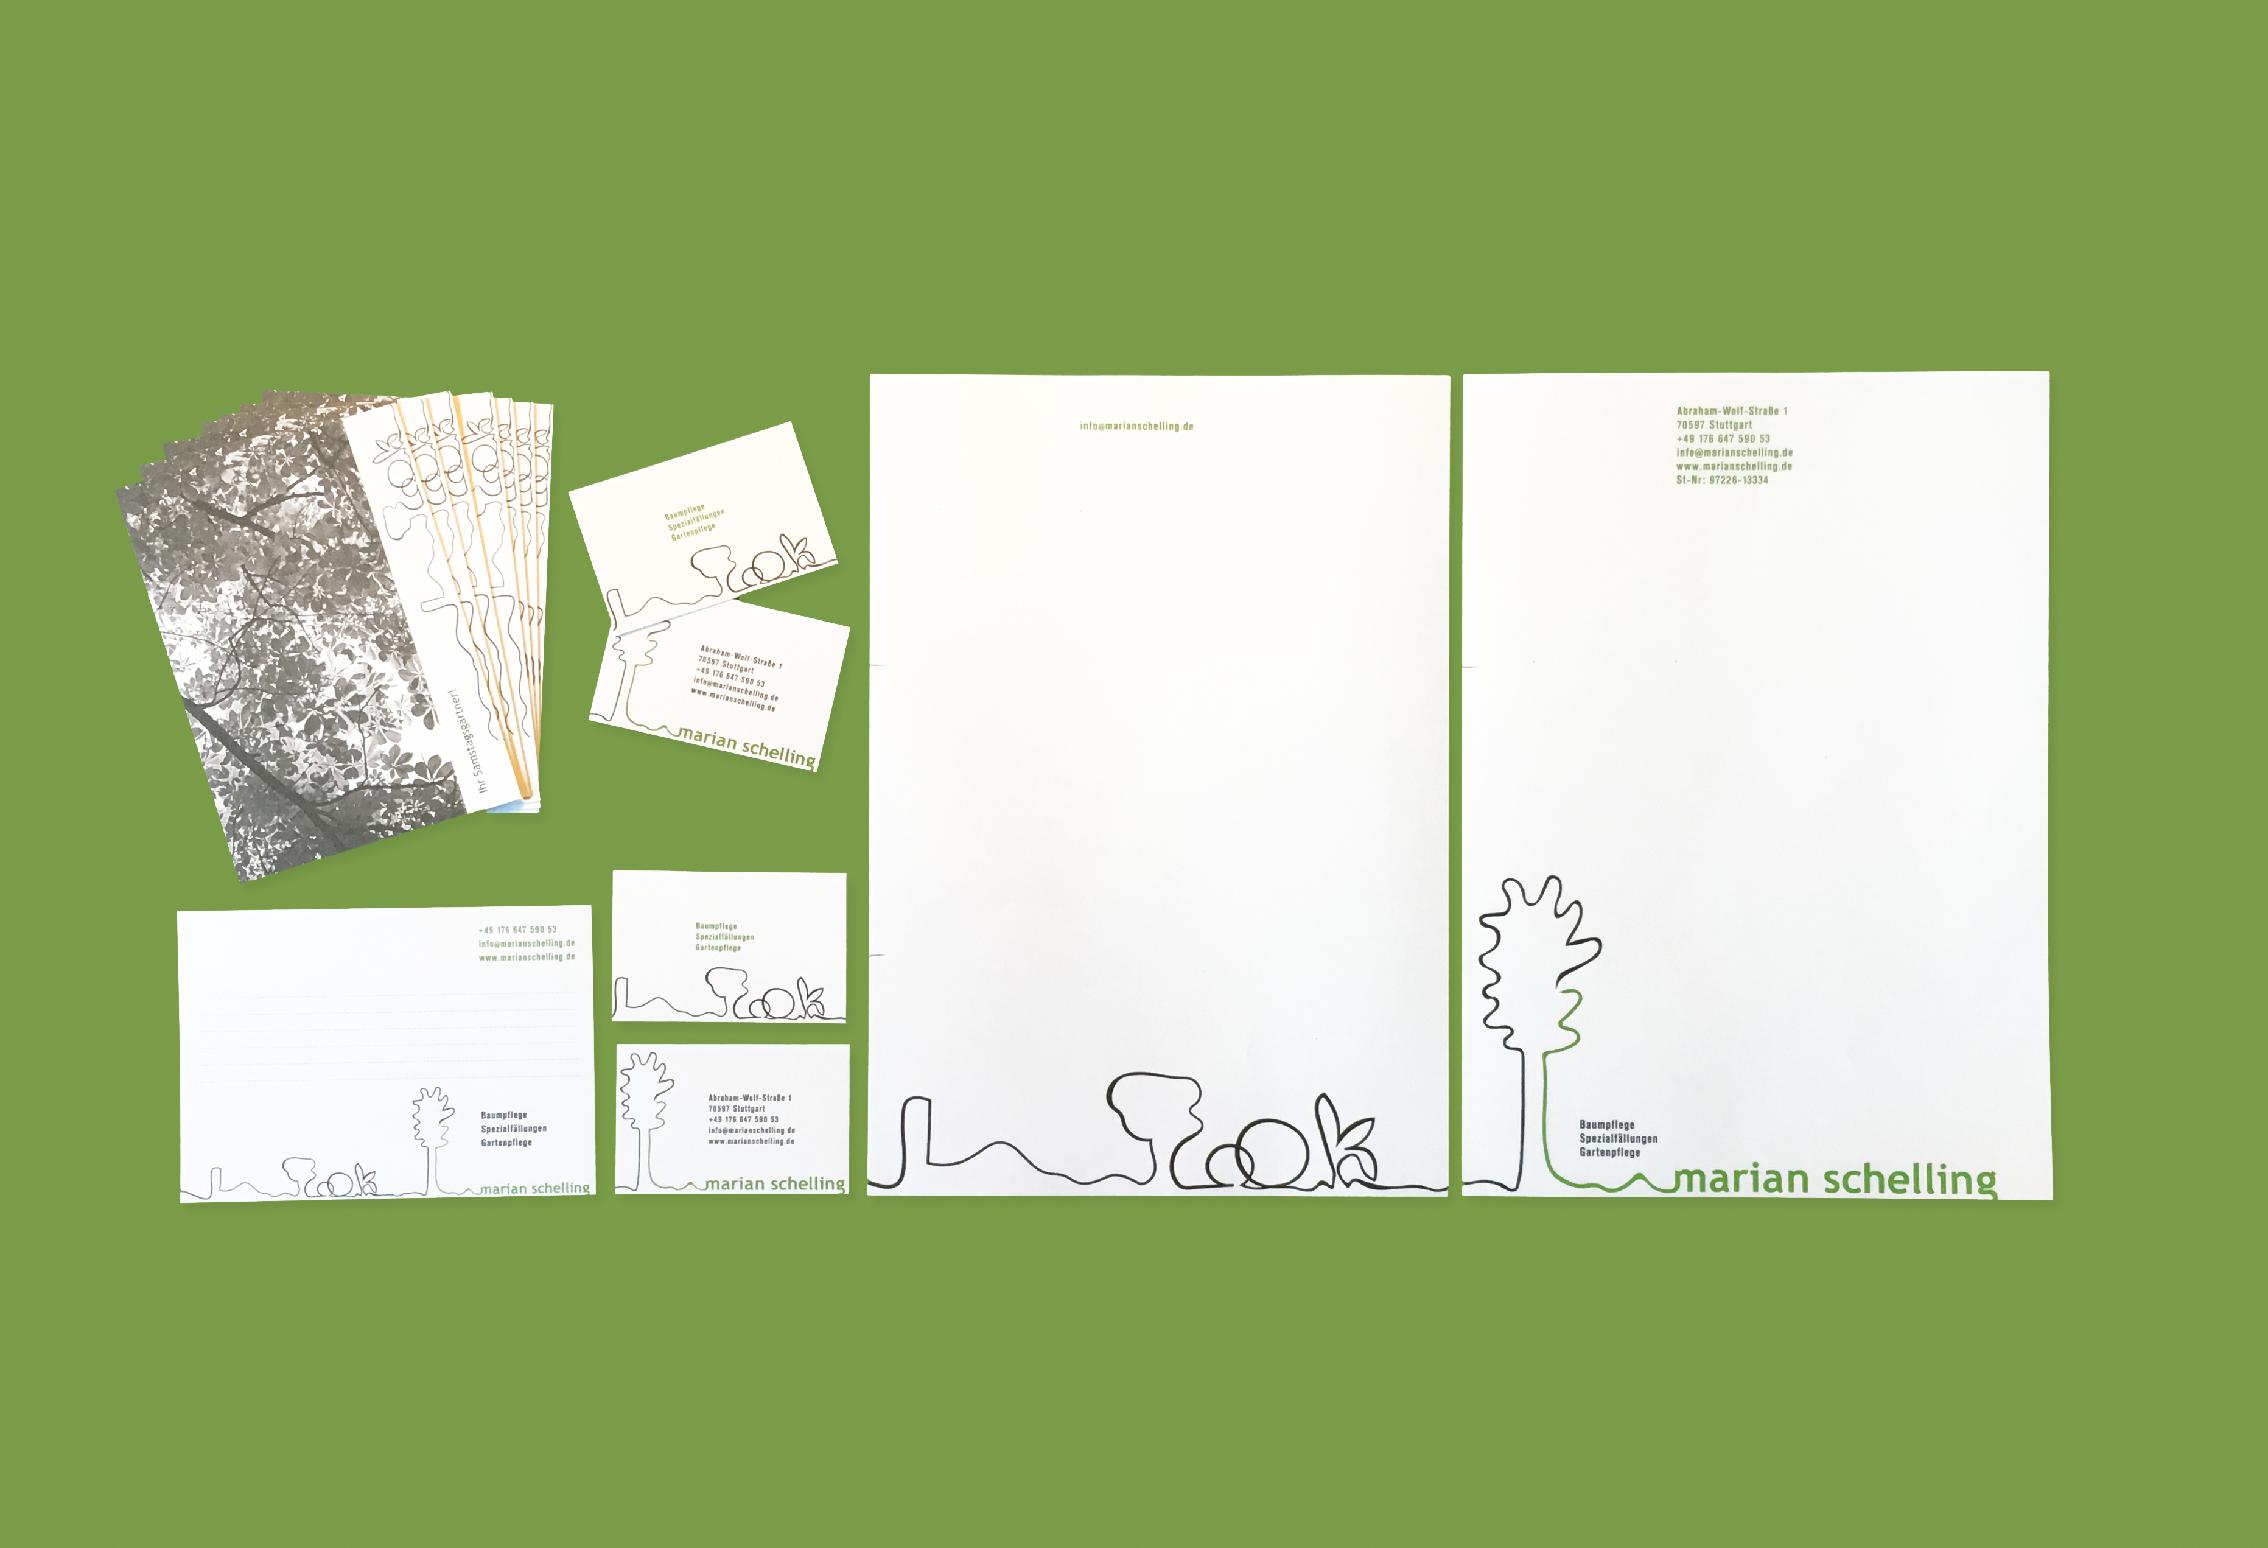 Postkarten, Visitenkarten, Briefbogen